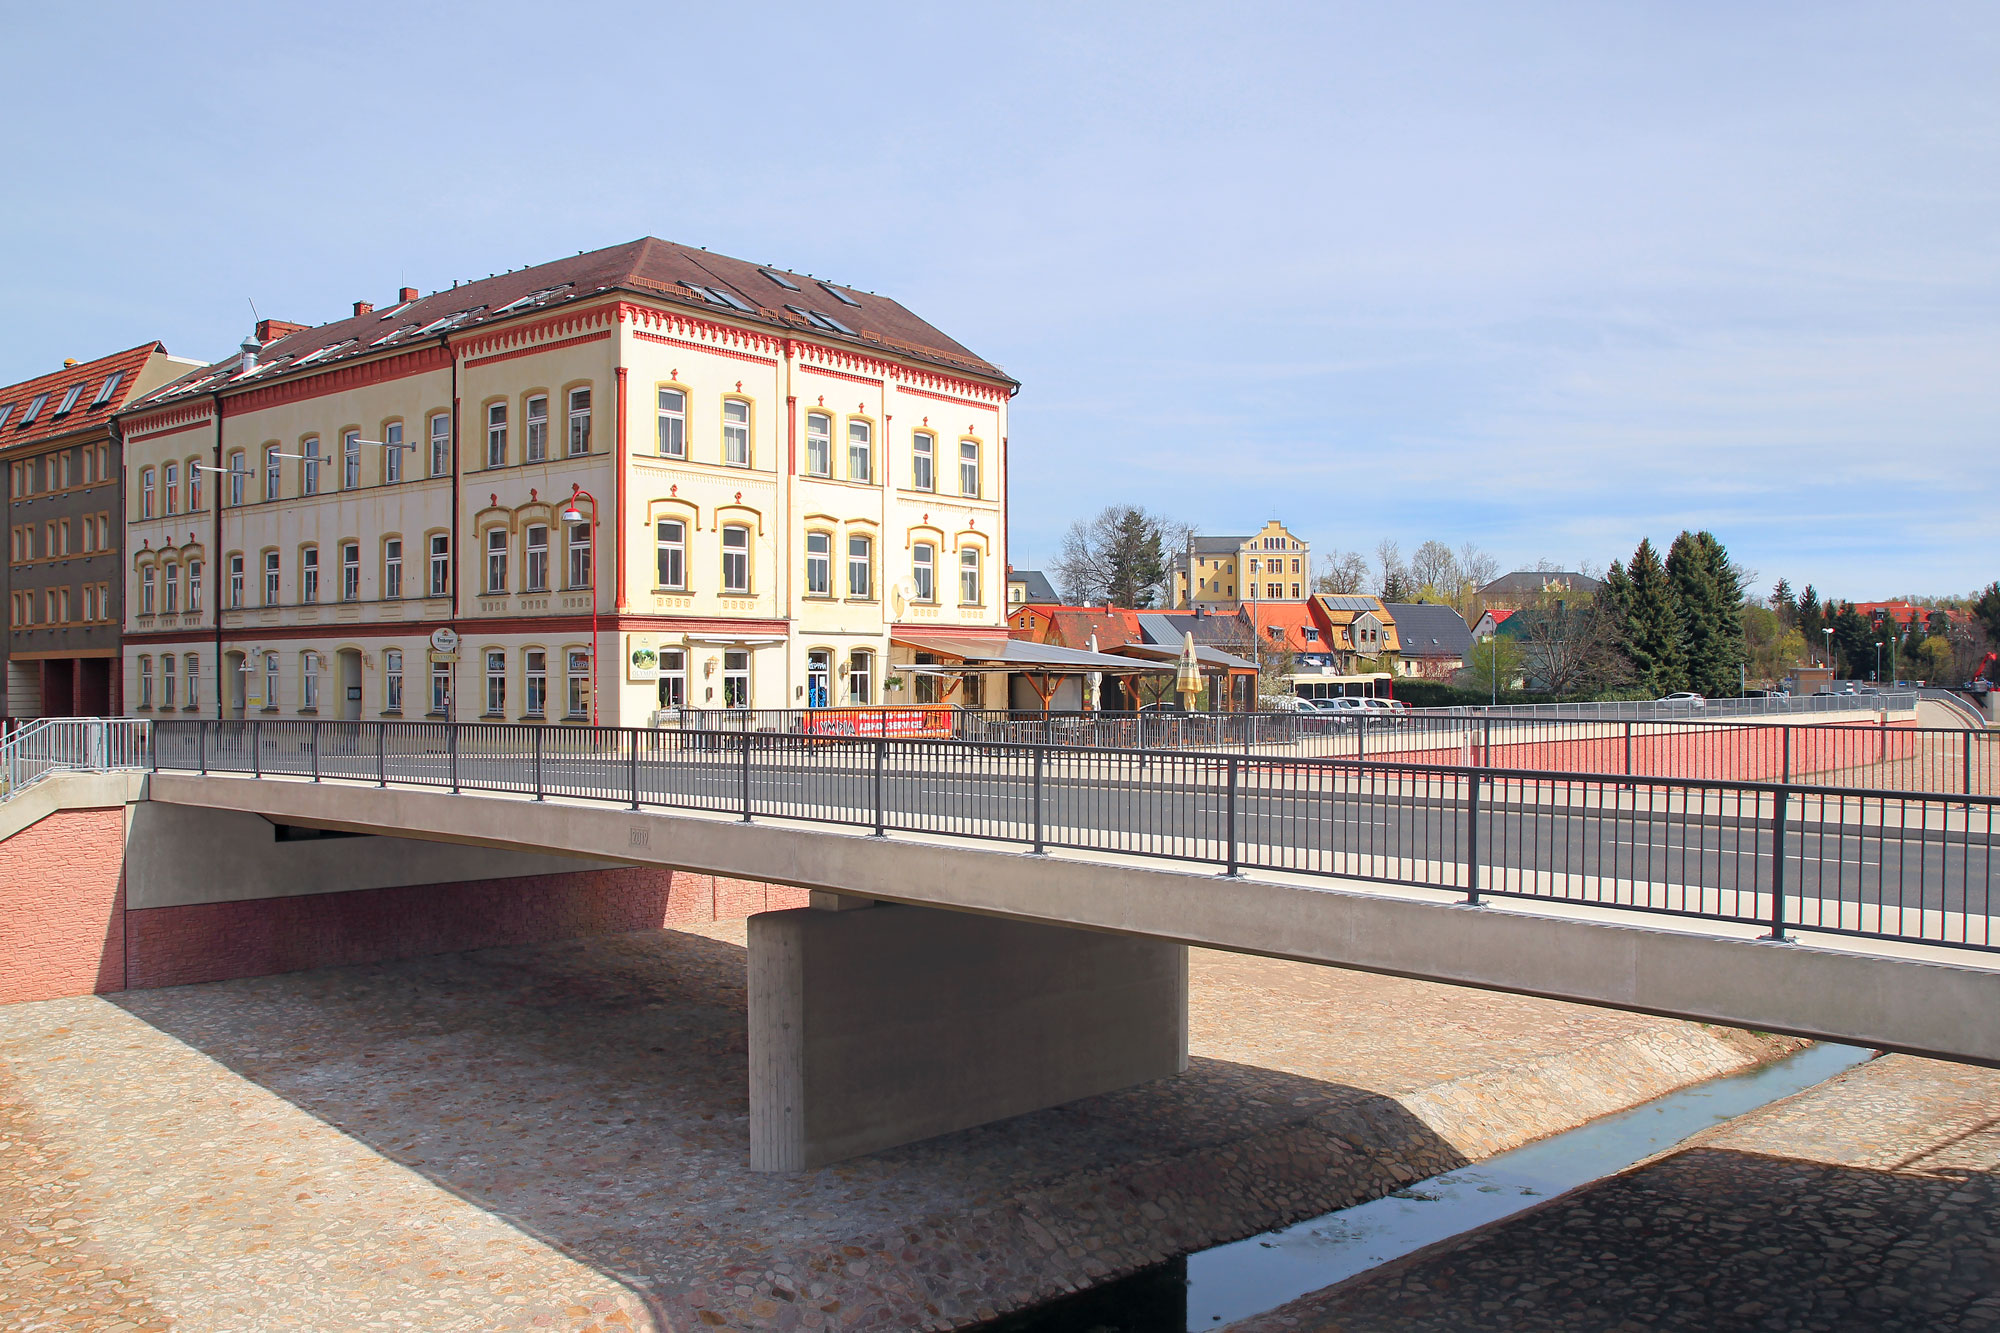 DöbelnFriedensbrücke